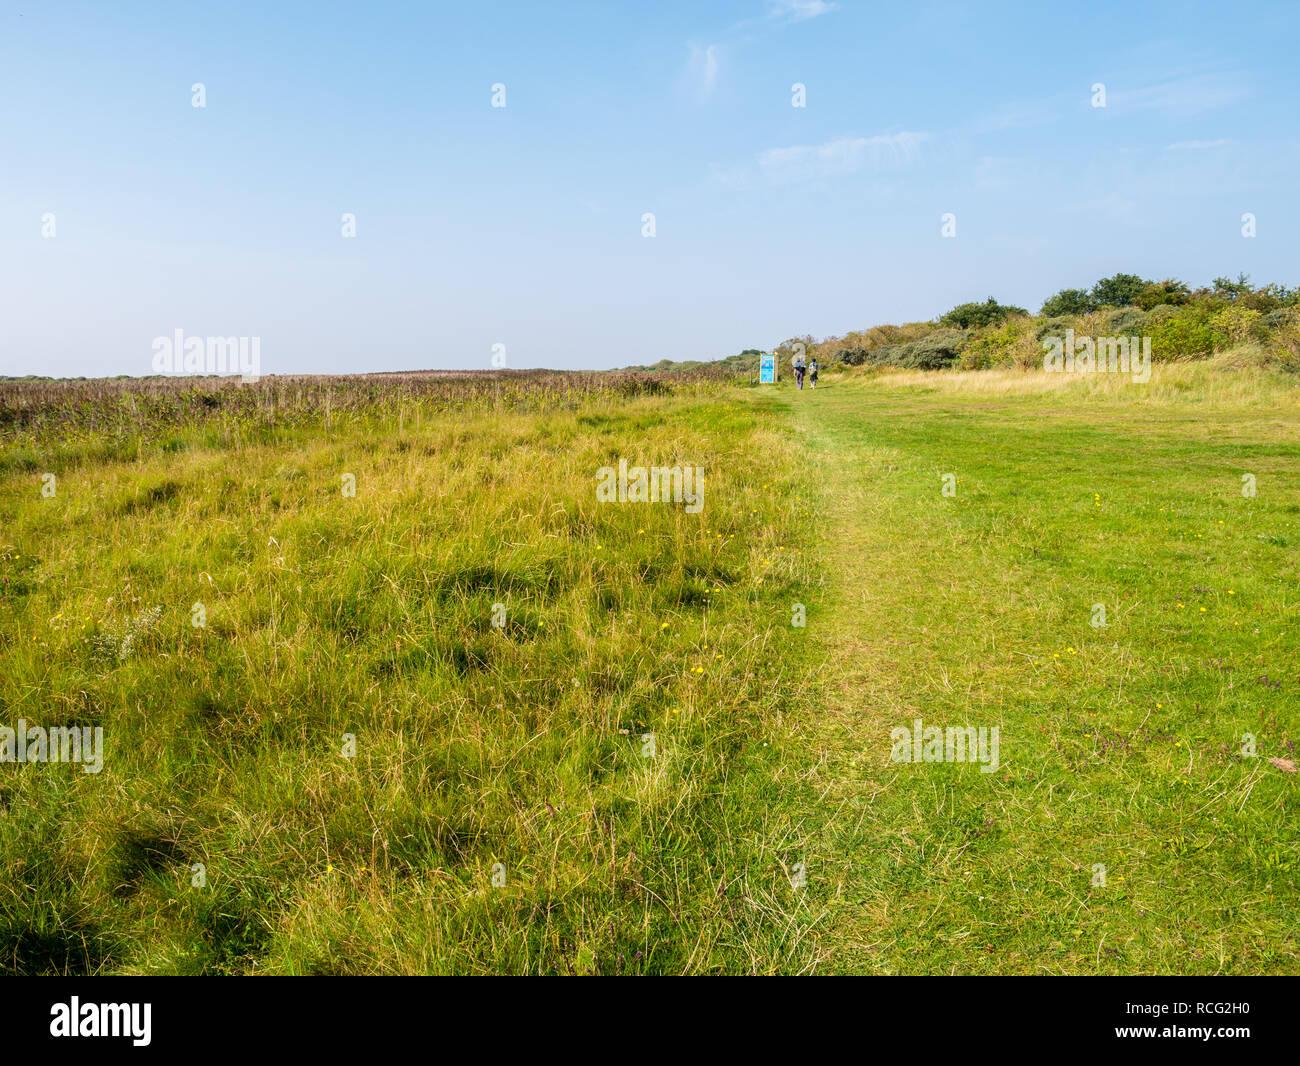 People walking on footpath of salt marshes on West Frisian island Schiermonnikoog, Friesland, Netherlands Stock Photo